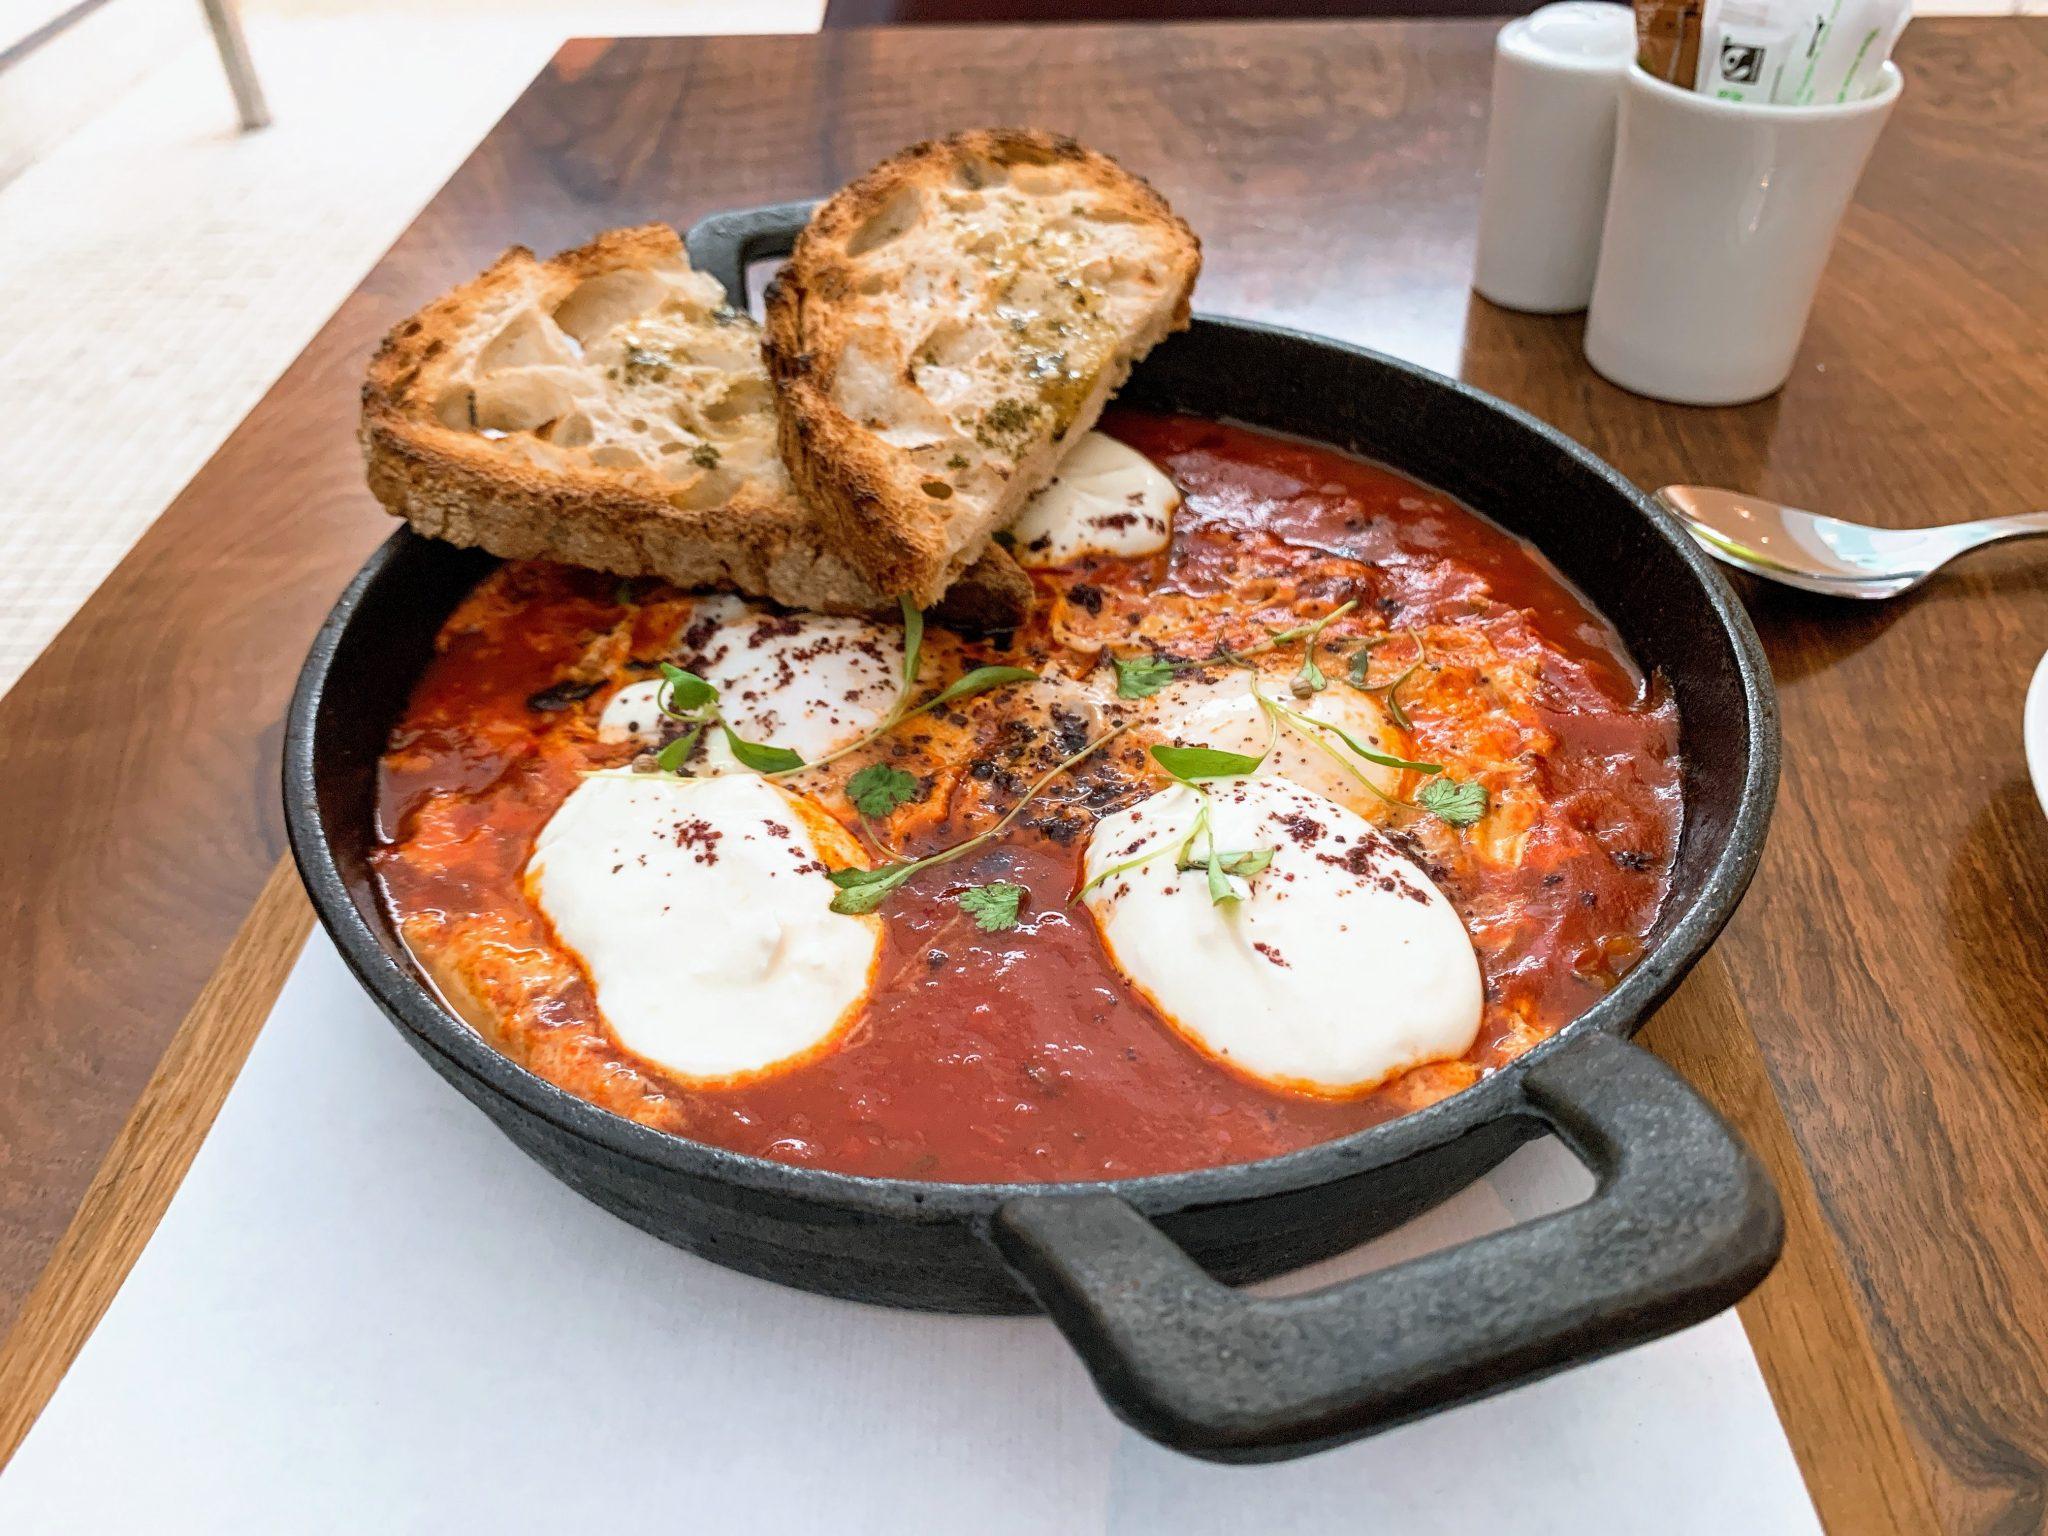 VIrgin clubhouse breakfast heathrow